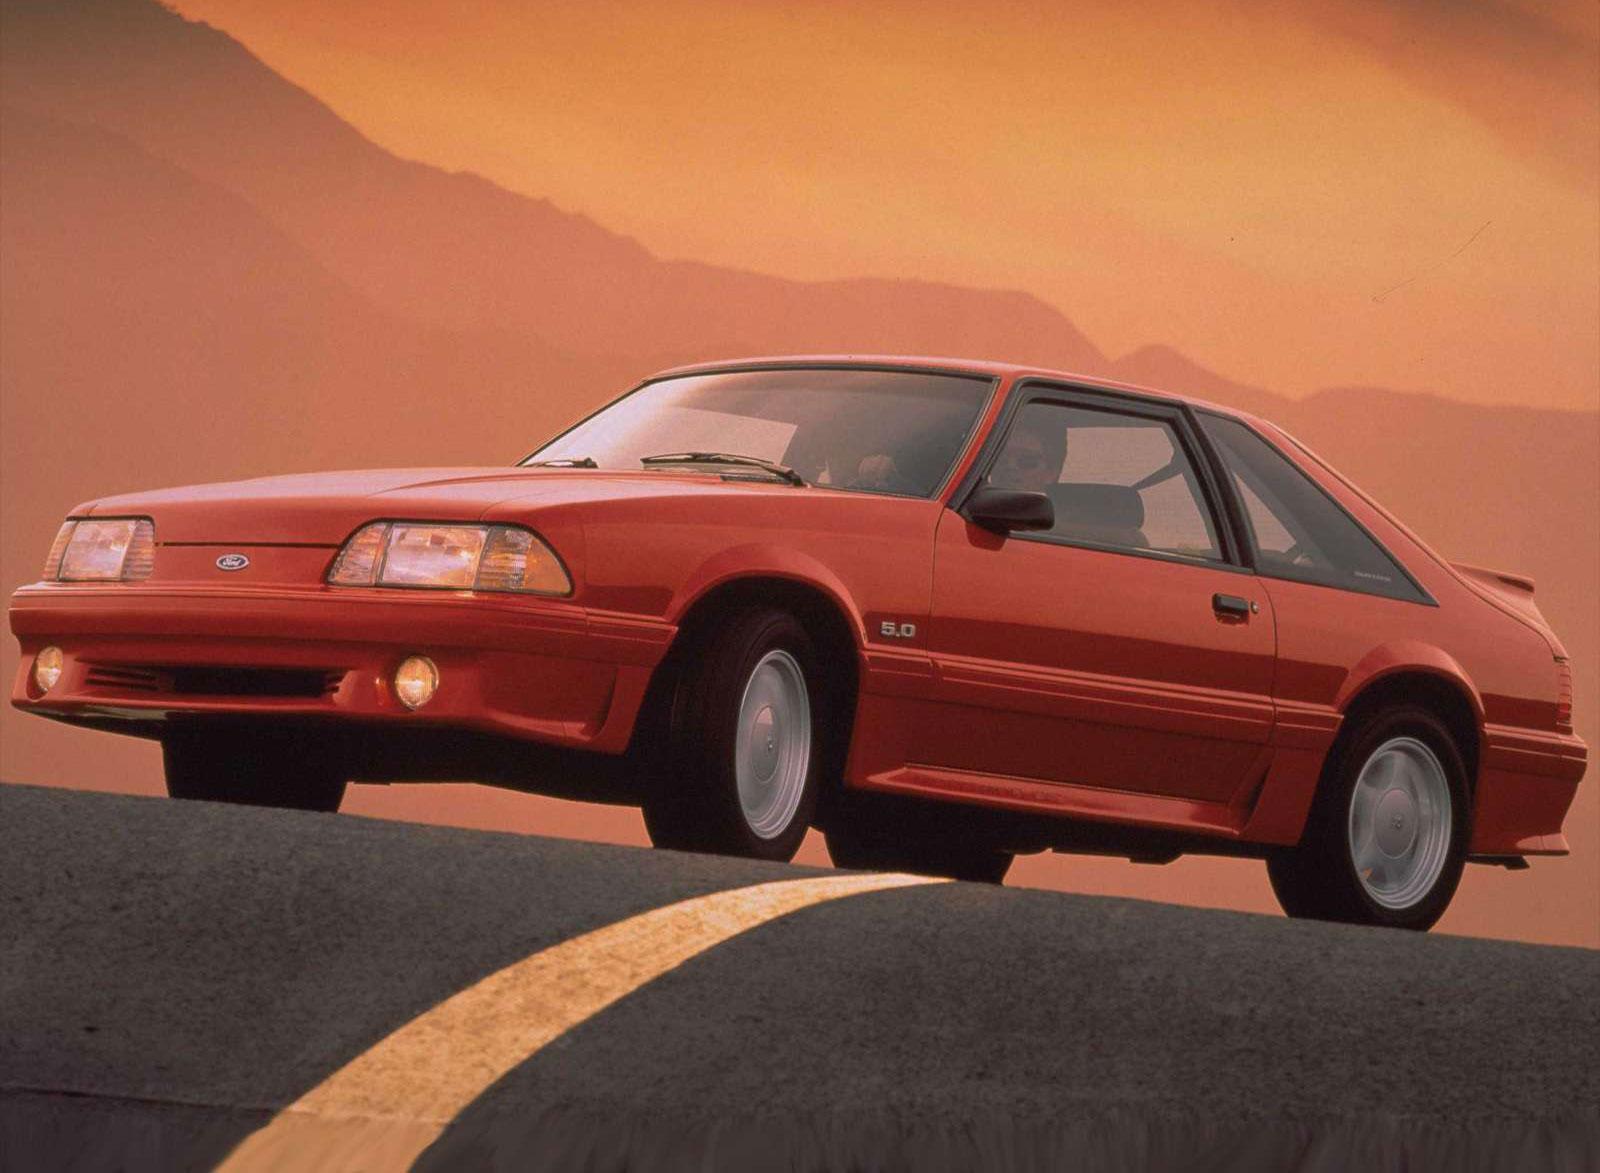 1993 Ford Mustang 5.0 GT Hatchback